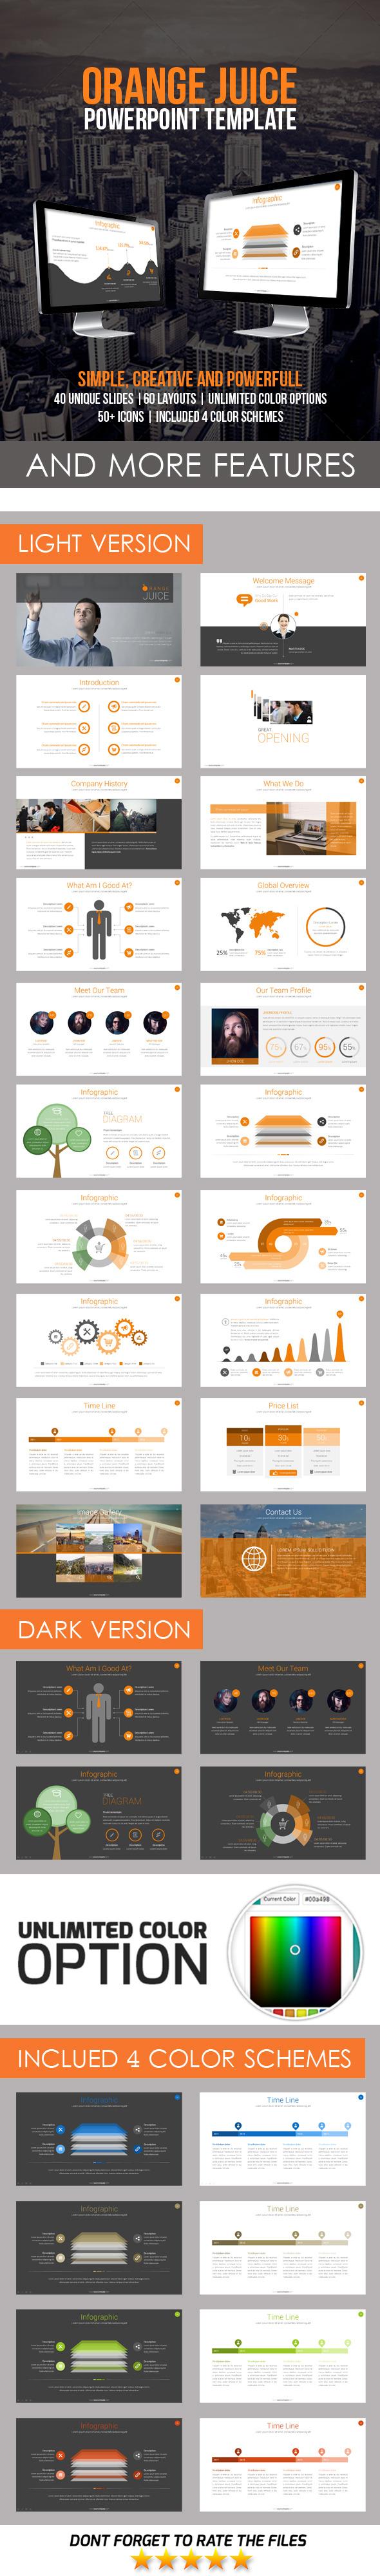 Orange Juice PowerPoint Template